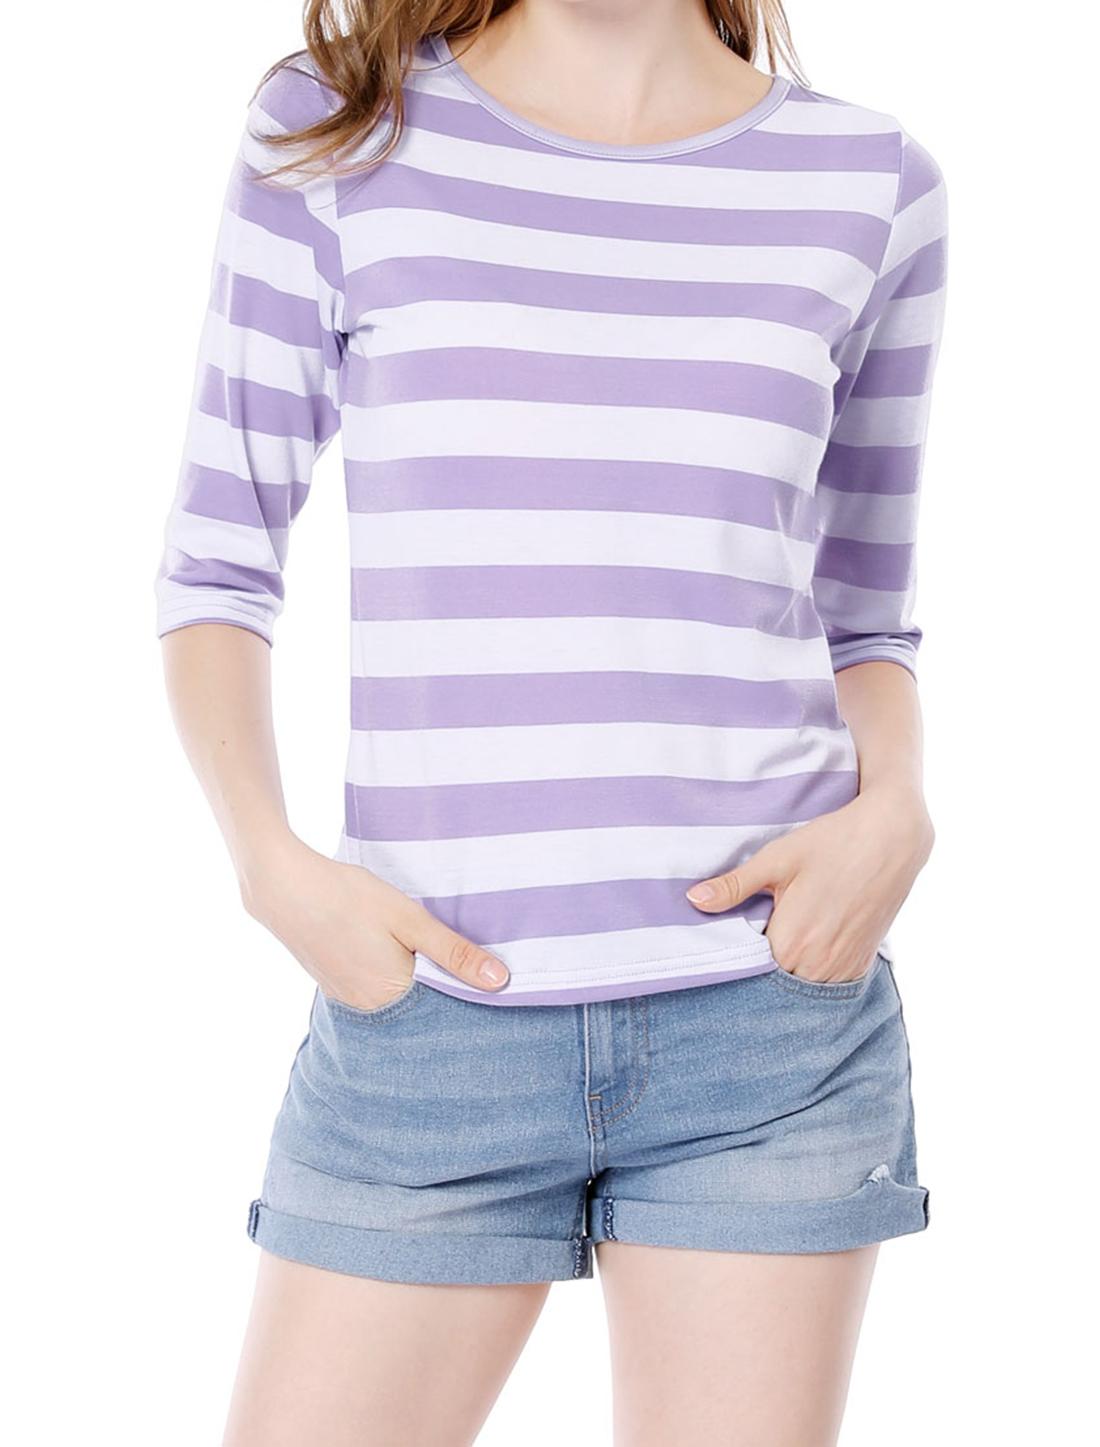 Allegra K Women Elbow Sleeve Contrast Color Printed Tee Light Purple XS